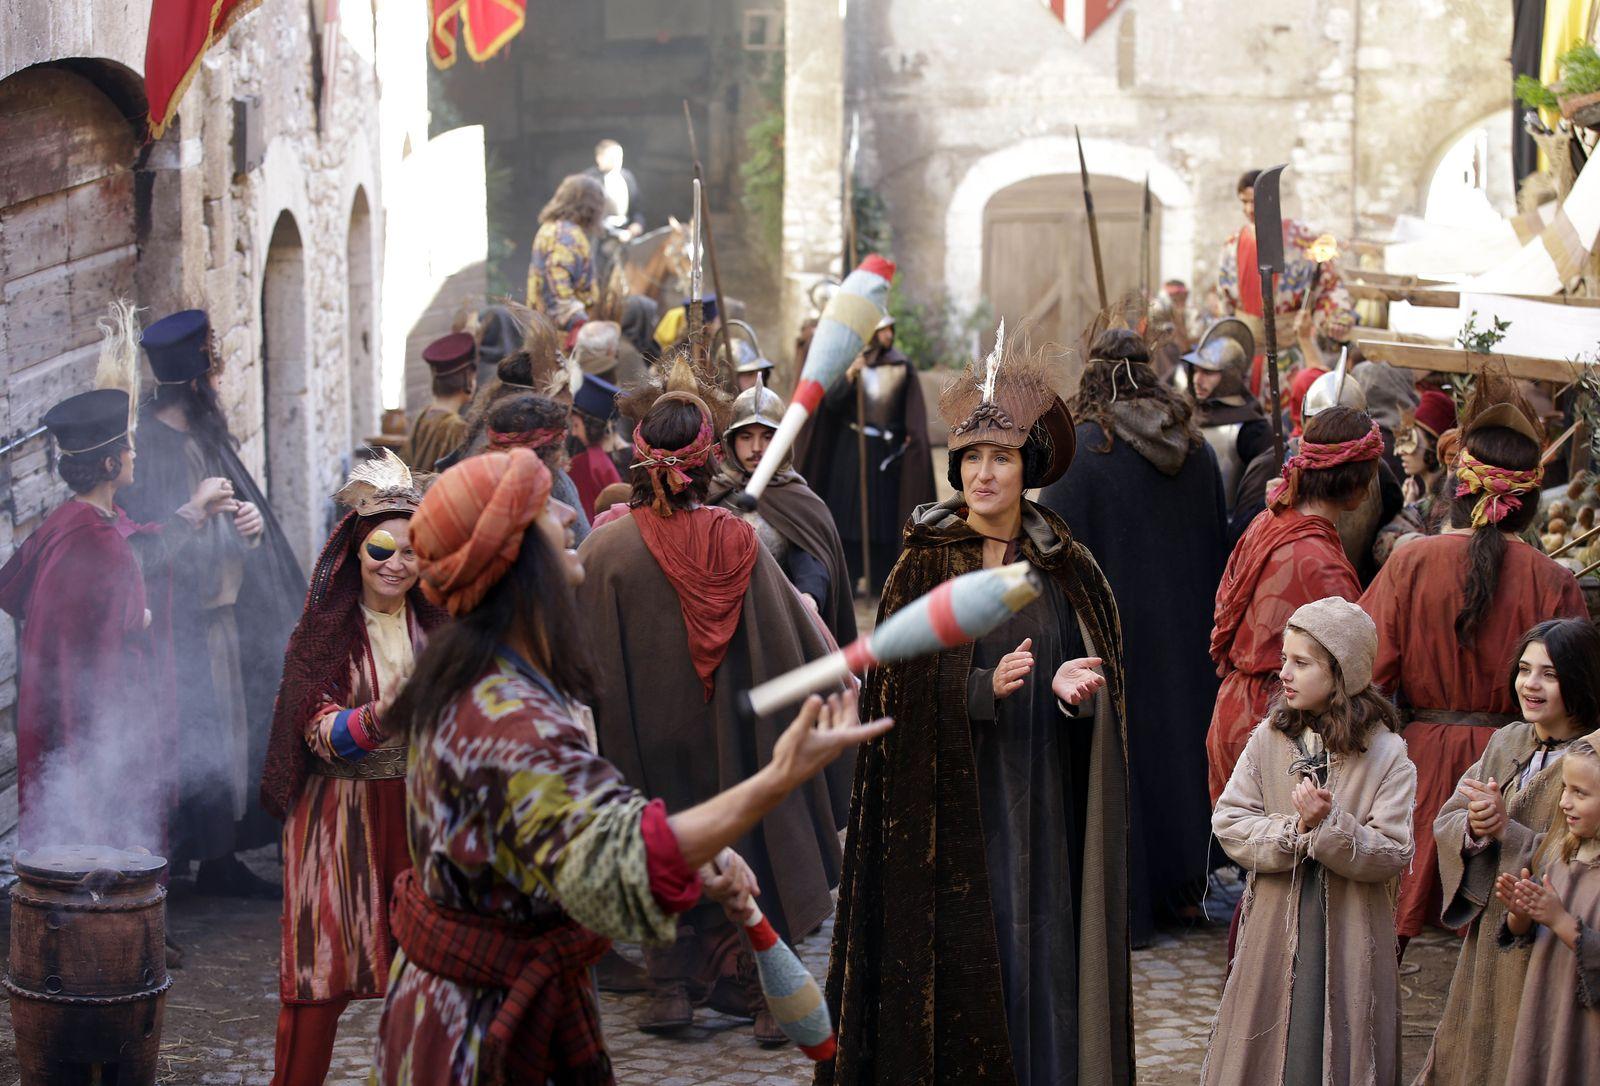 Abiperlen Mittelalter Markt